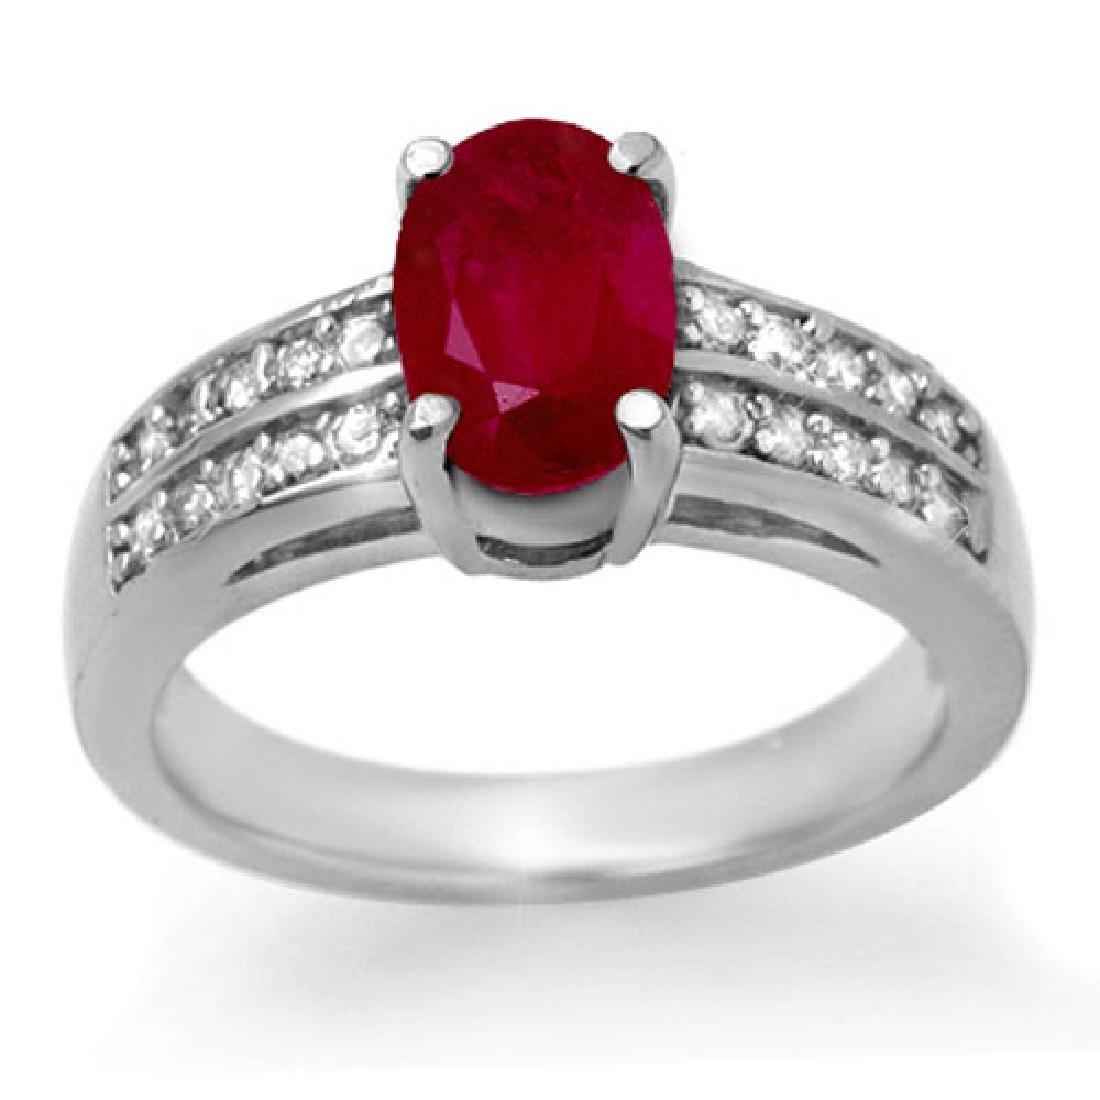 3.38 CTW Ruby & Diamond Ring 14K White Gold